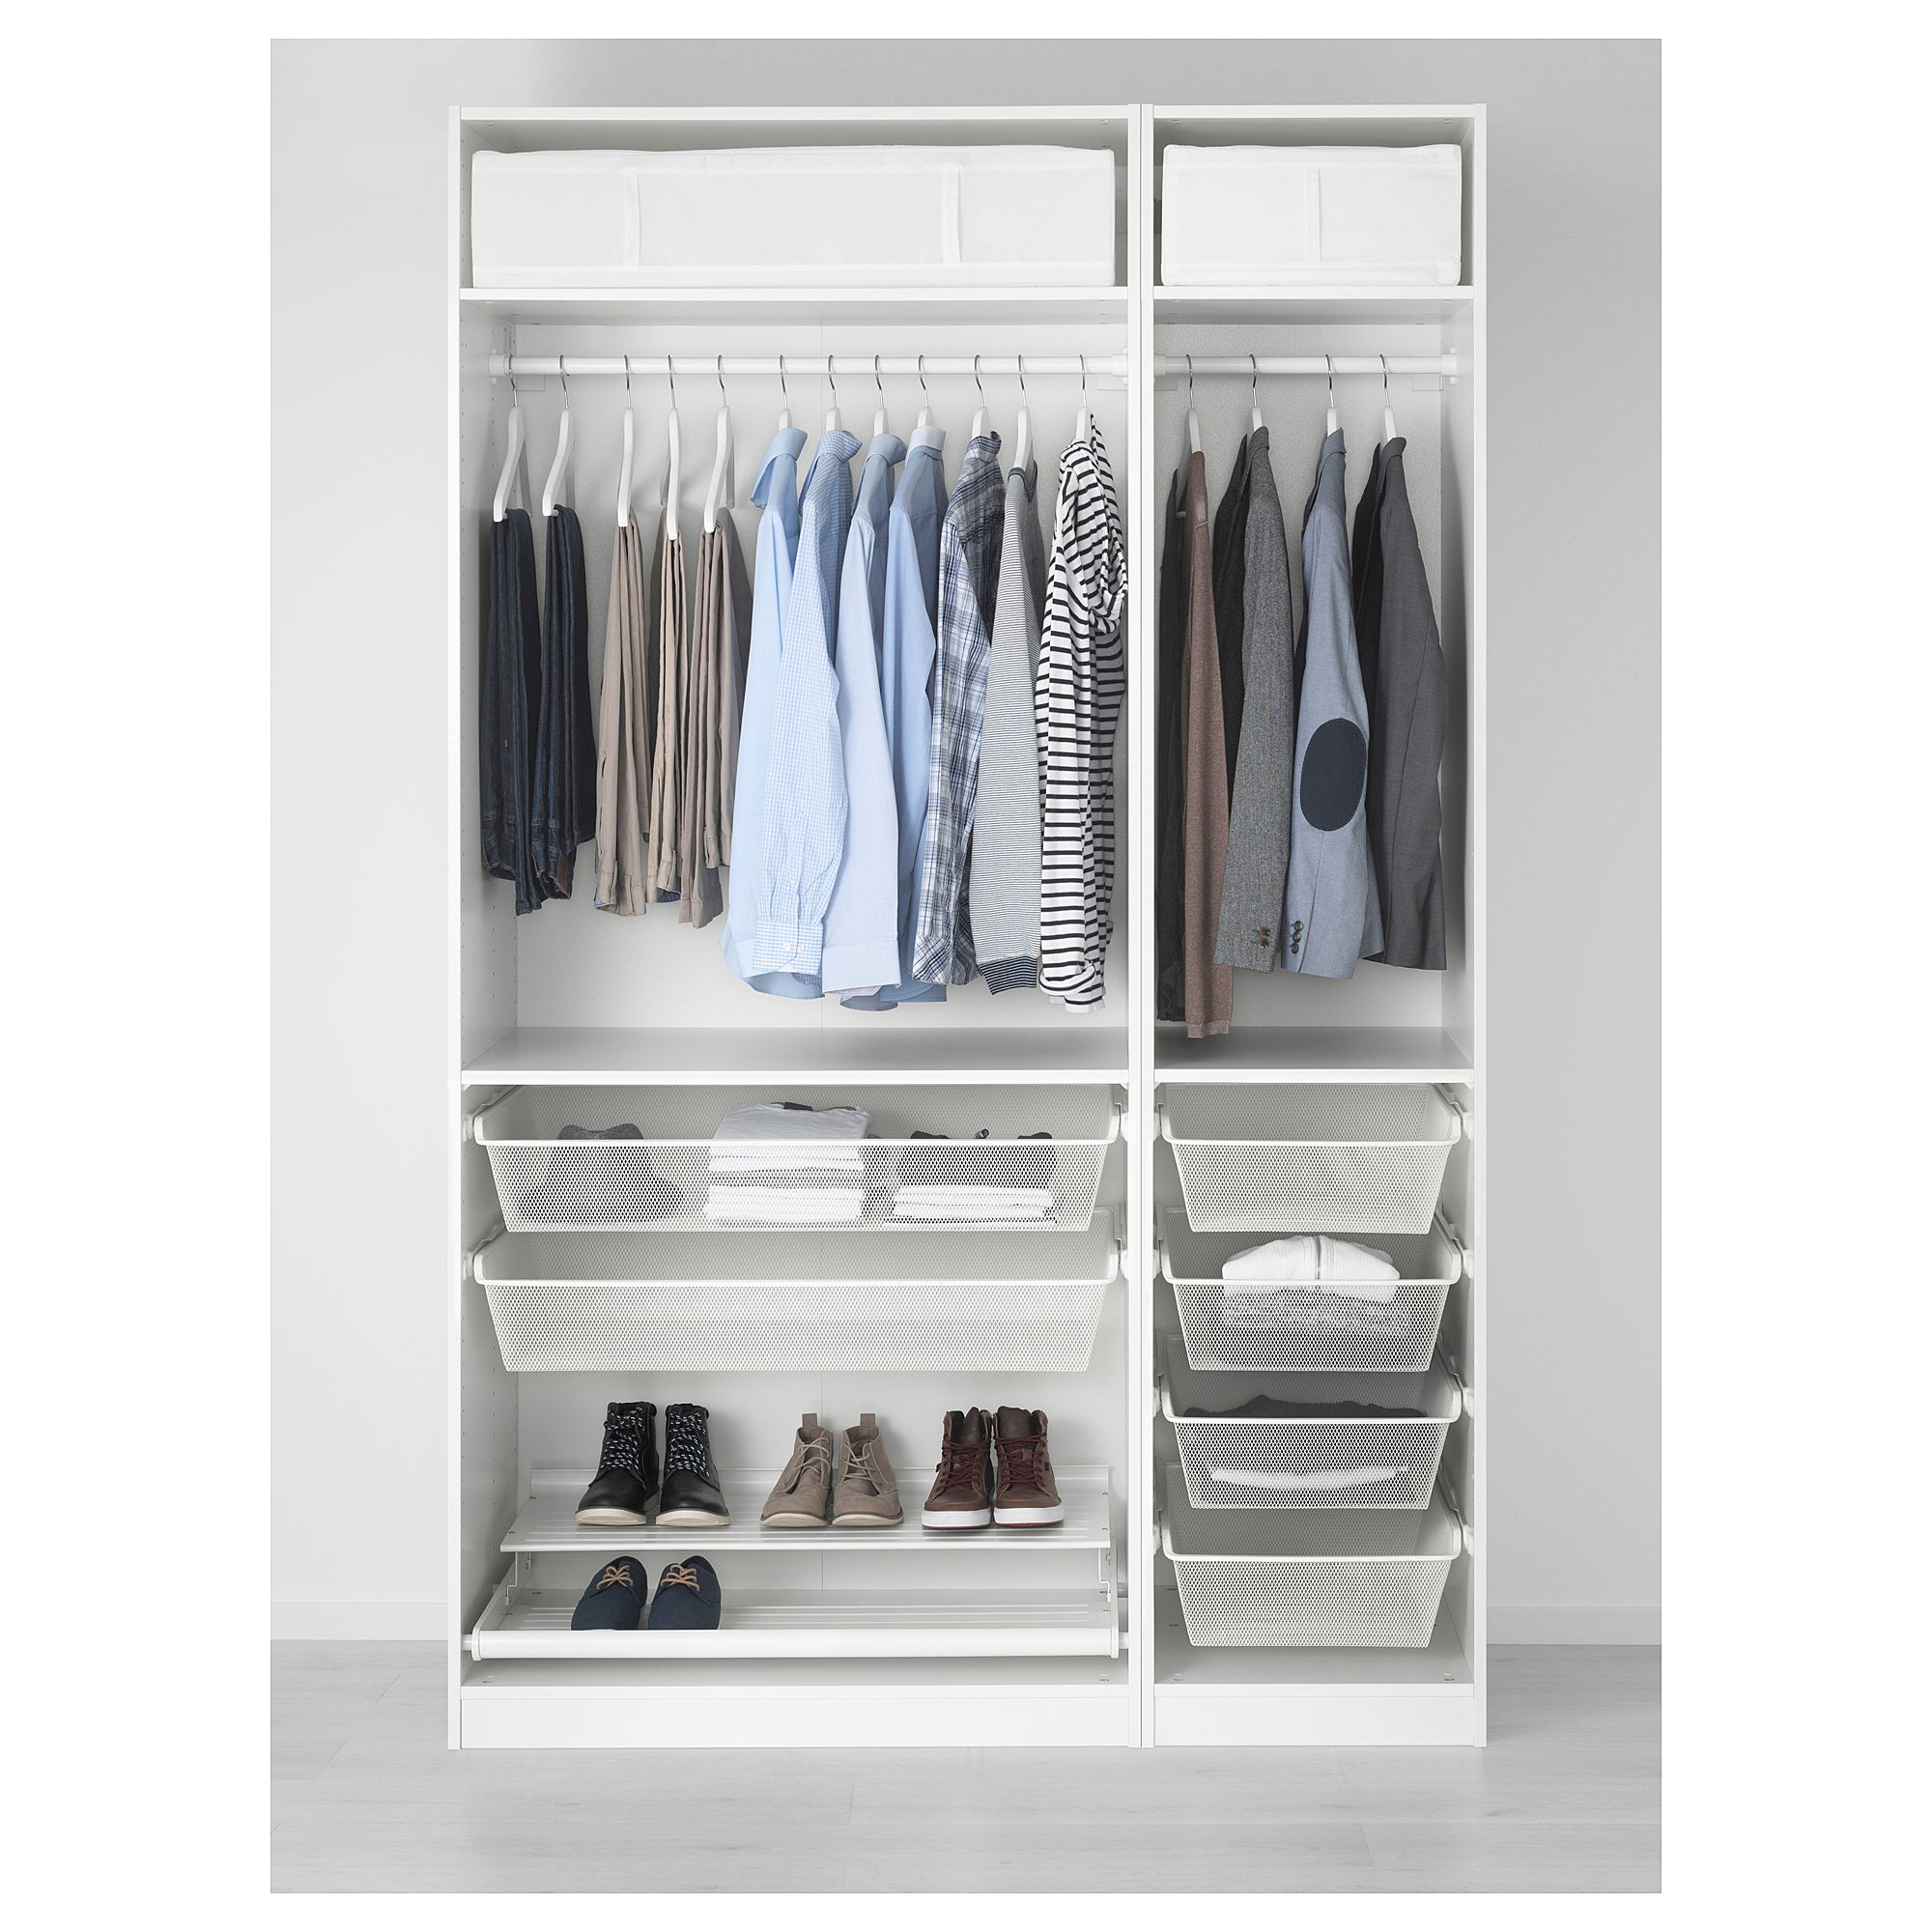 PAX Wardrobe White, Fardal High-gloss/white